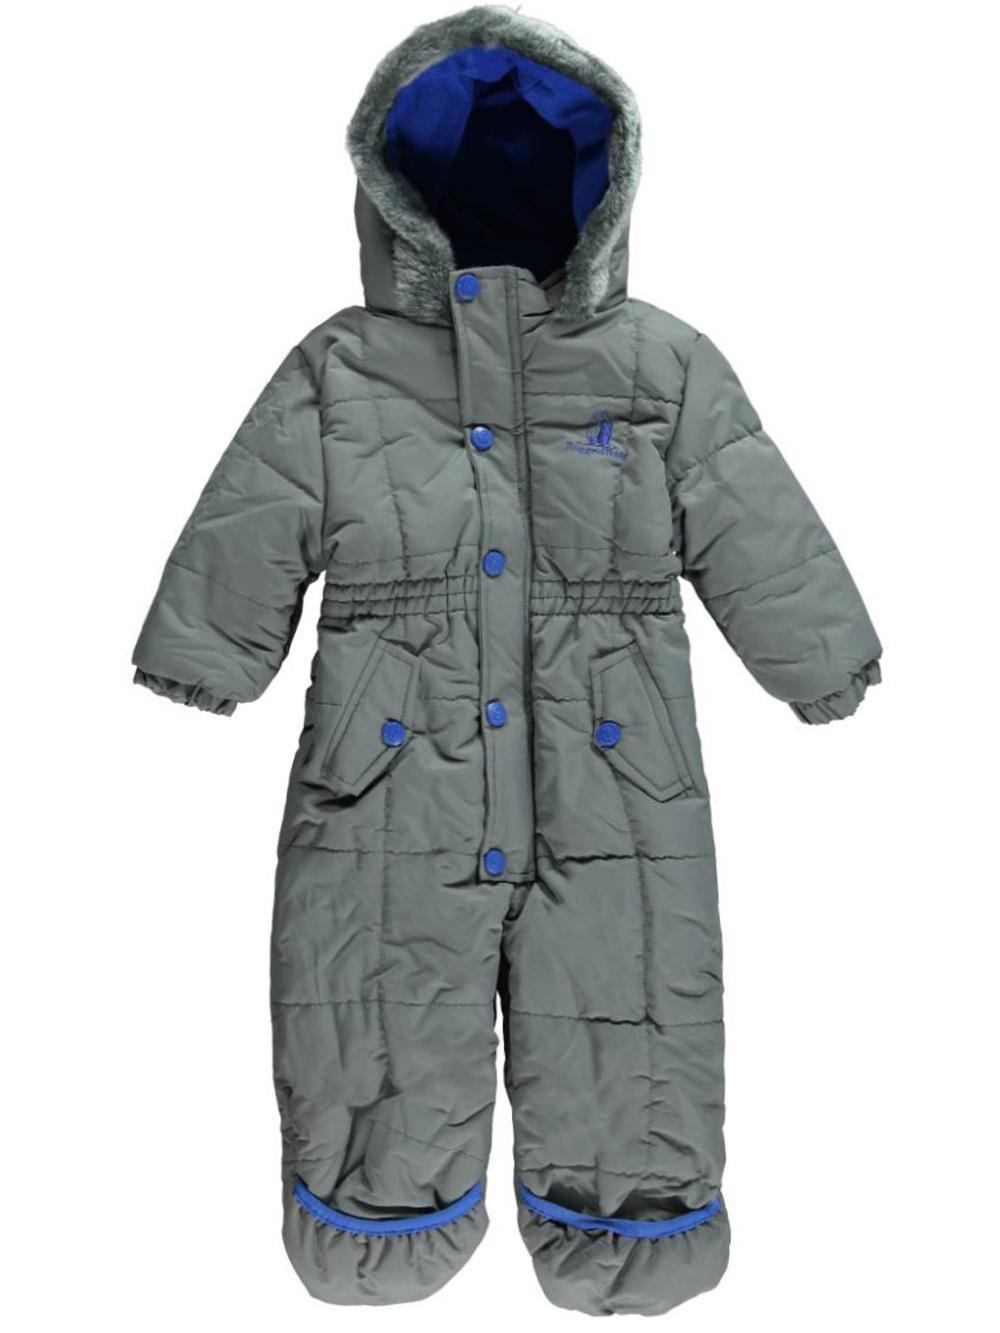 Rugged Bear Baby Boys All Bundled Snowsuit